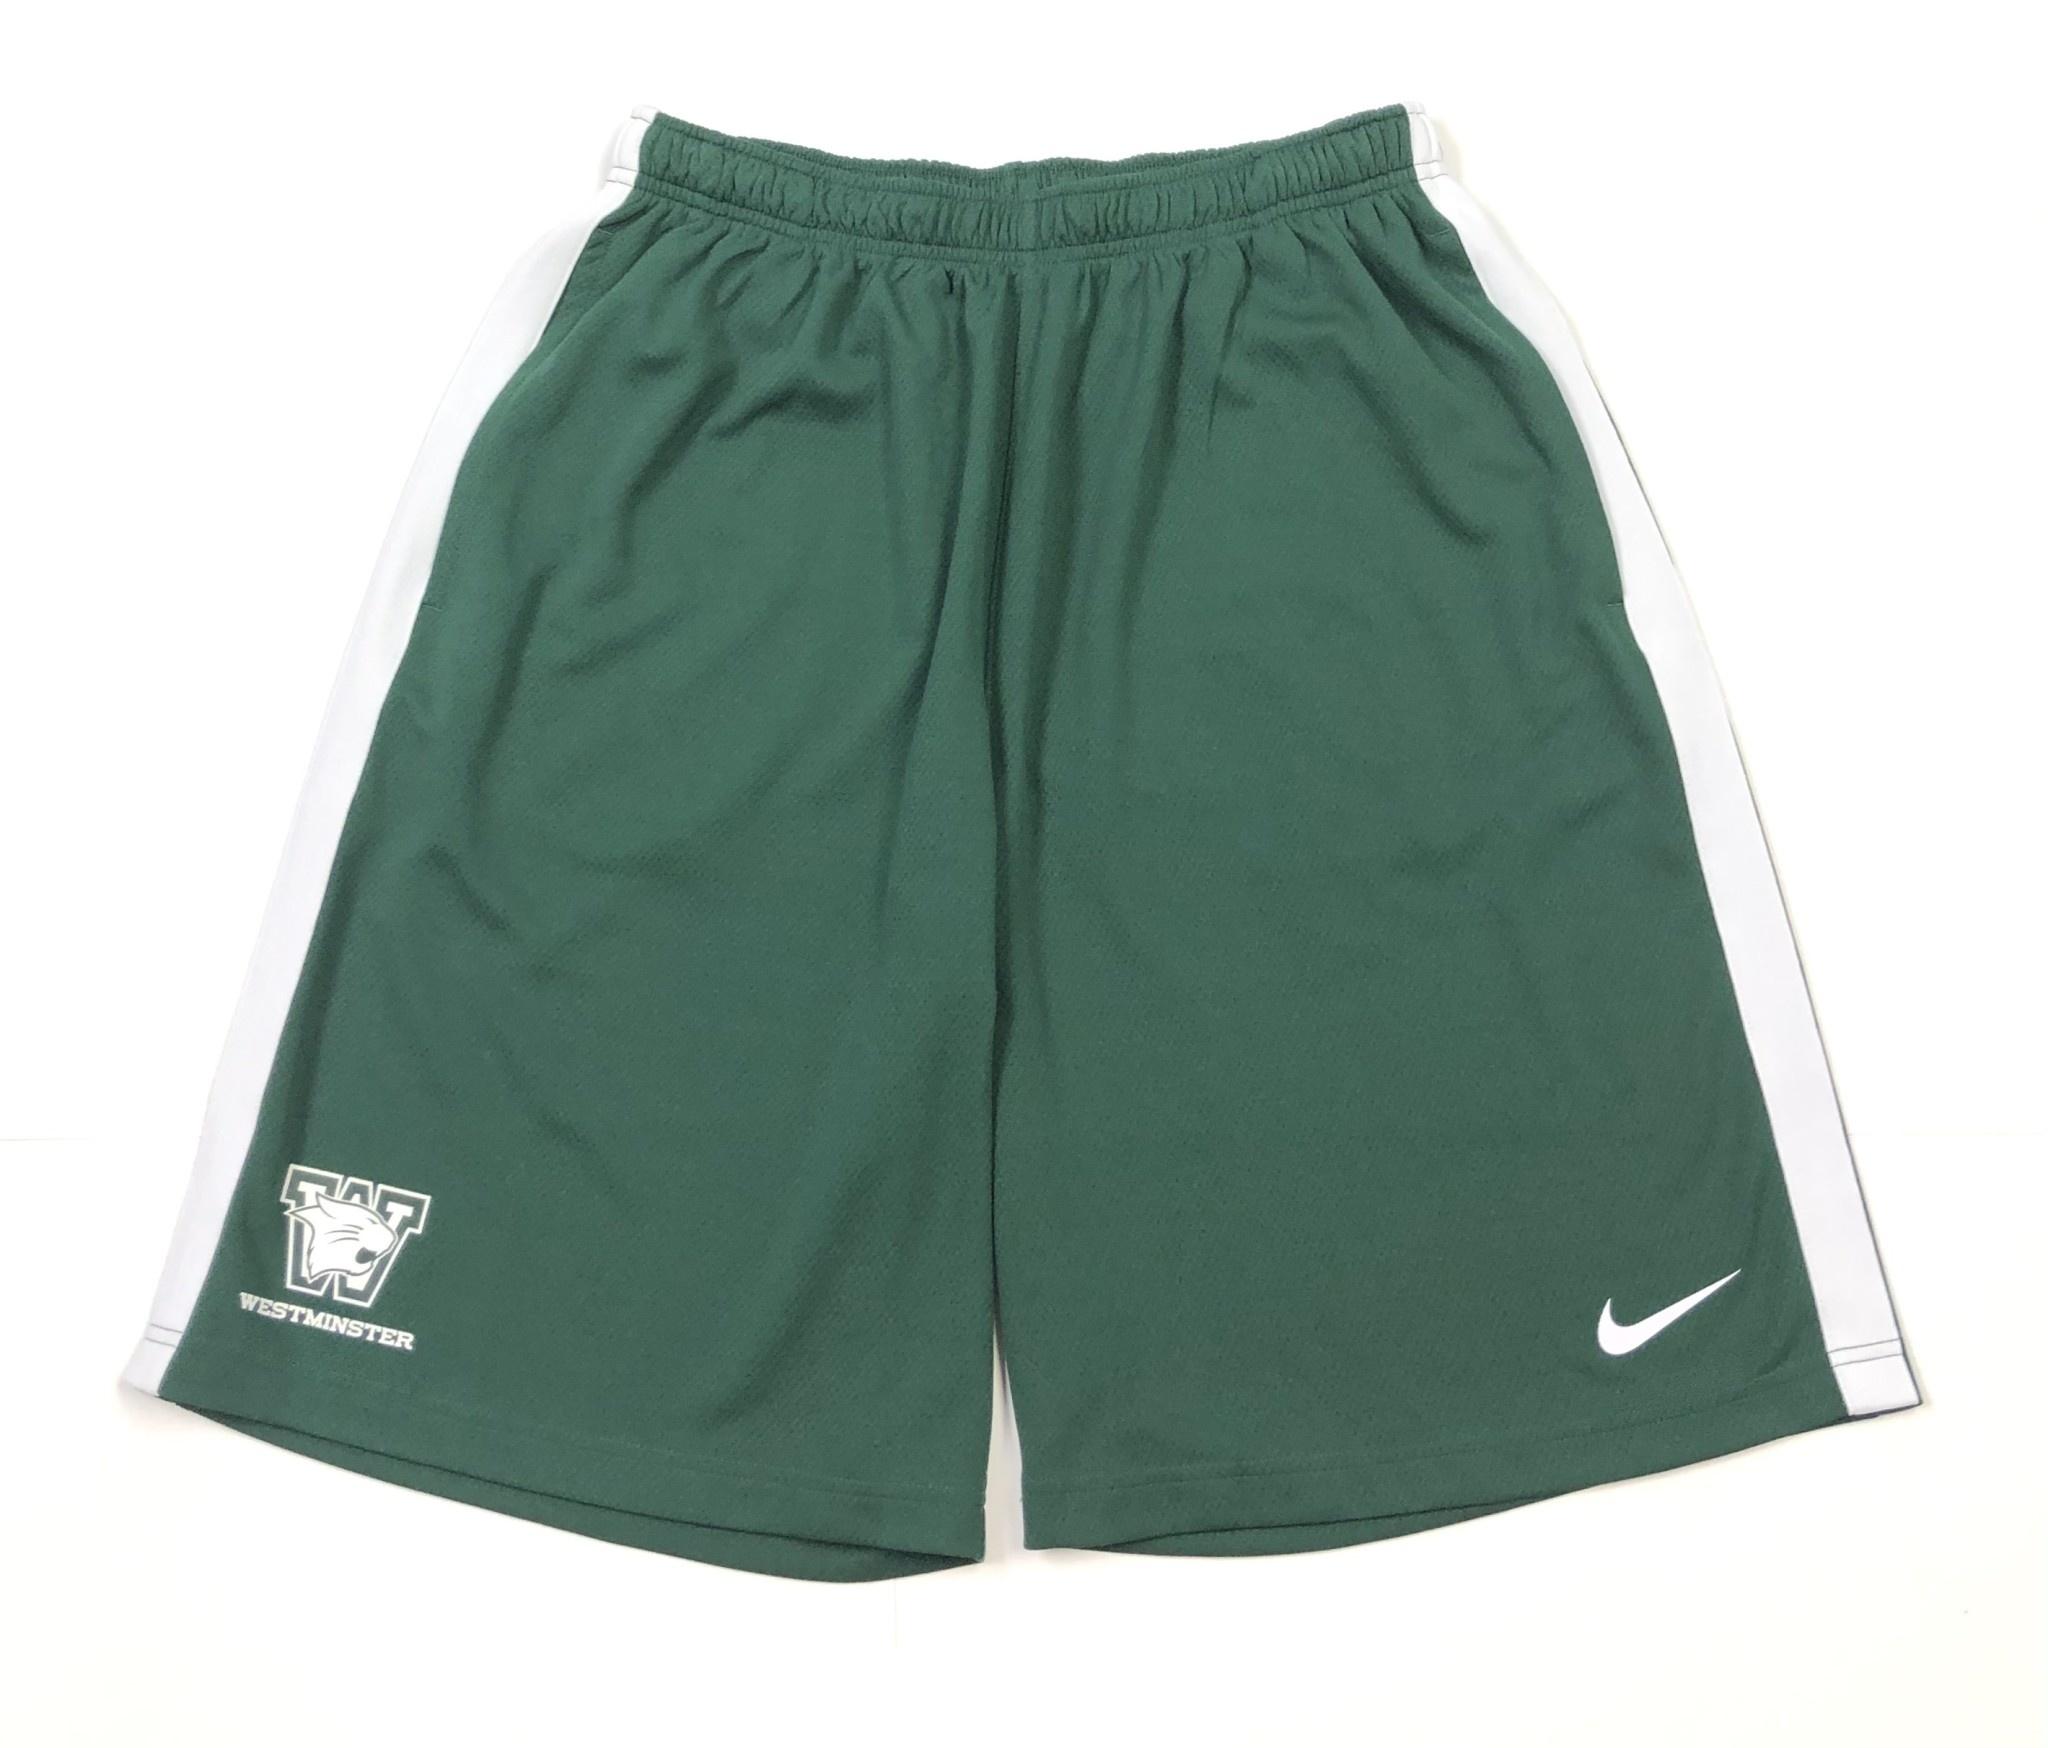 Nike Shorts: Nike Epic Dark Green/White with White Side Stripe